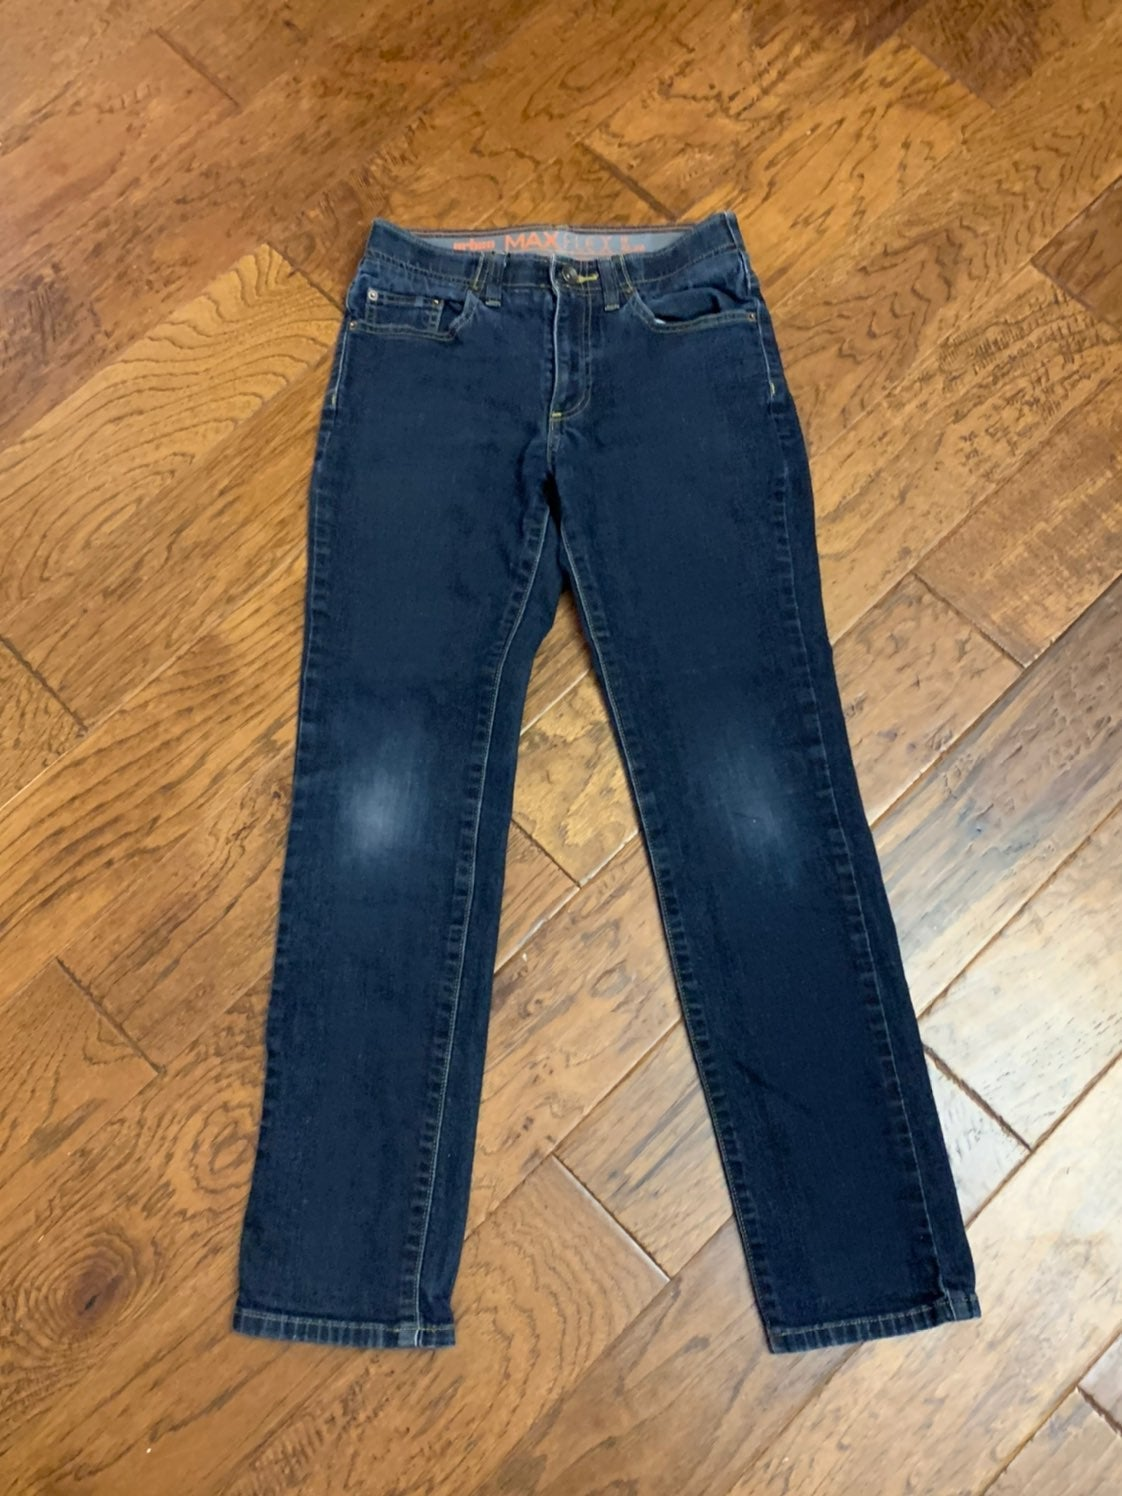 Boys Urban Pipeline jeans